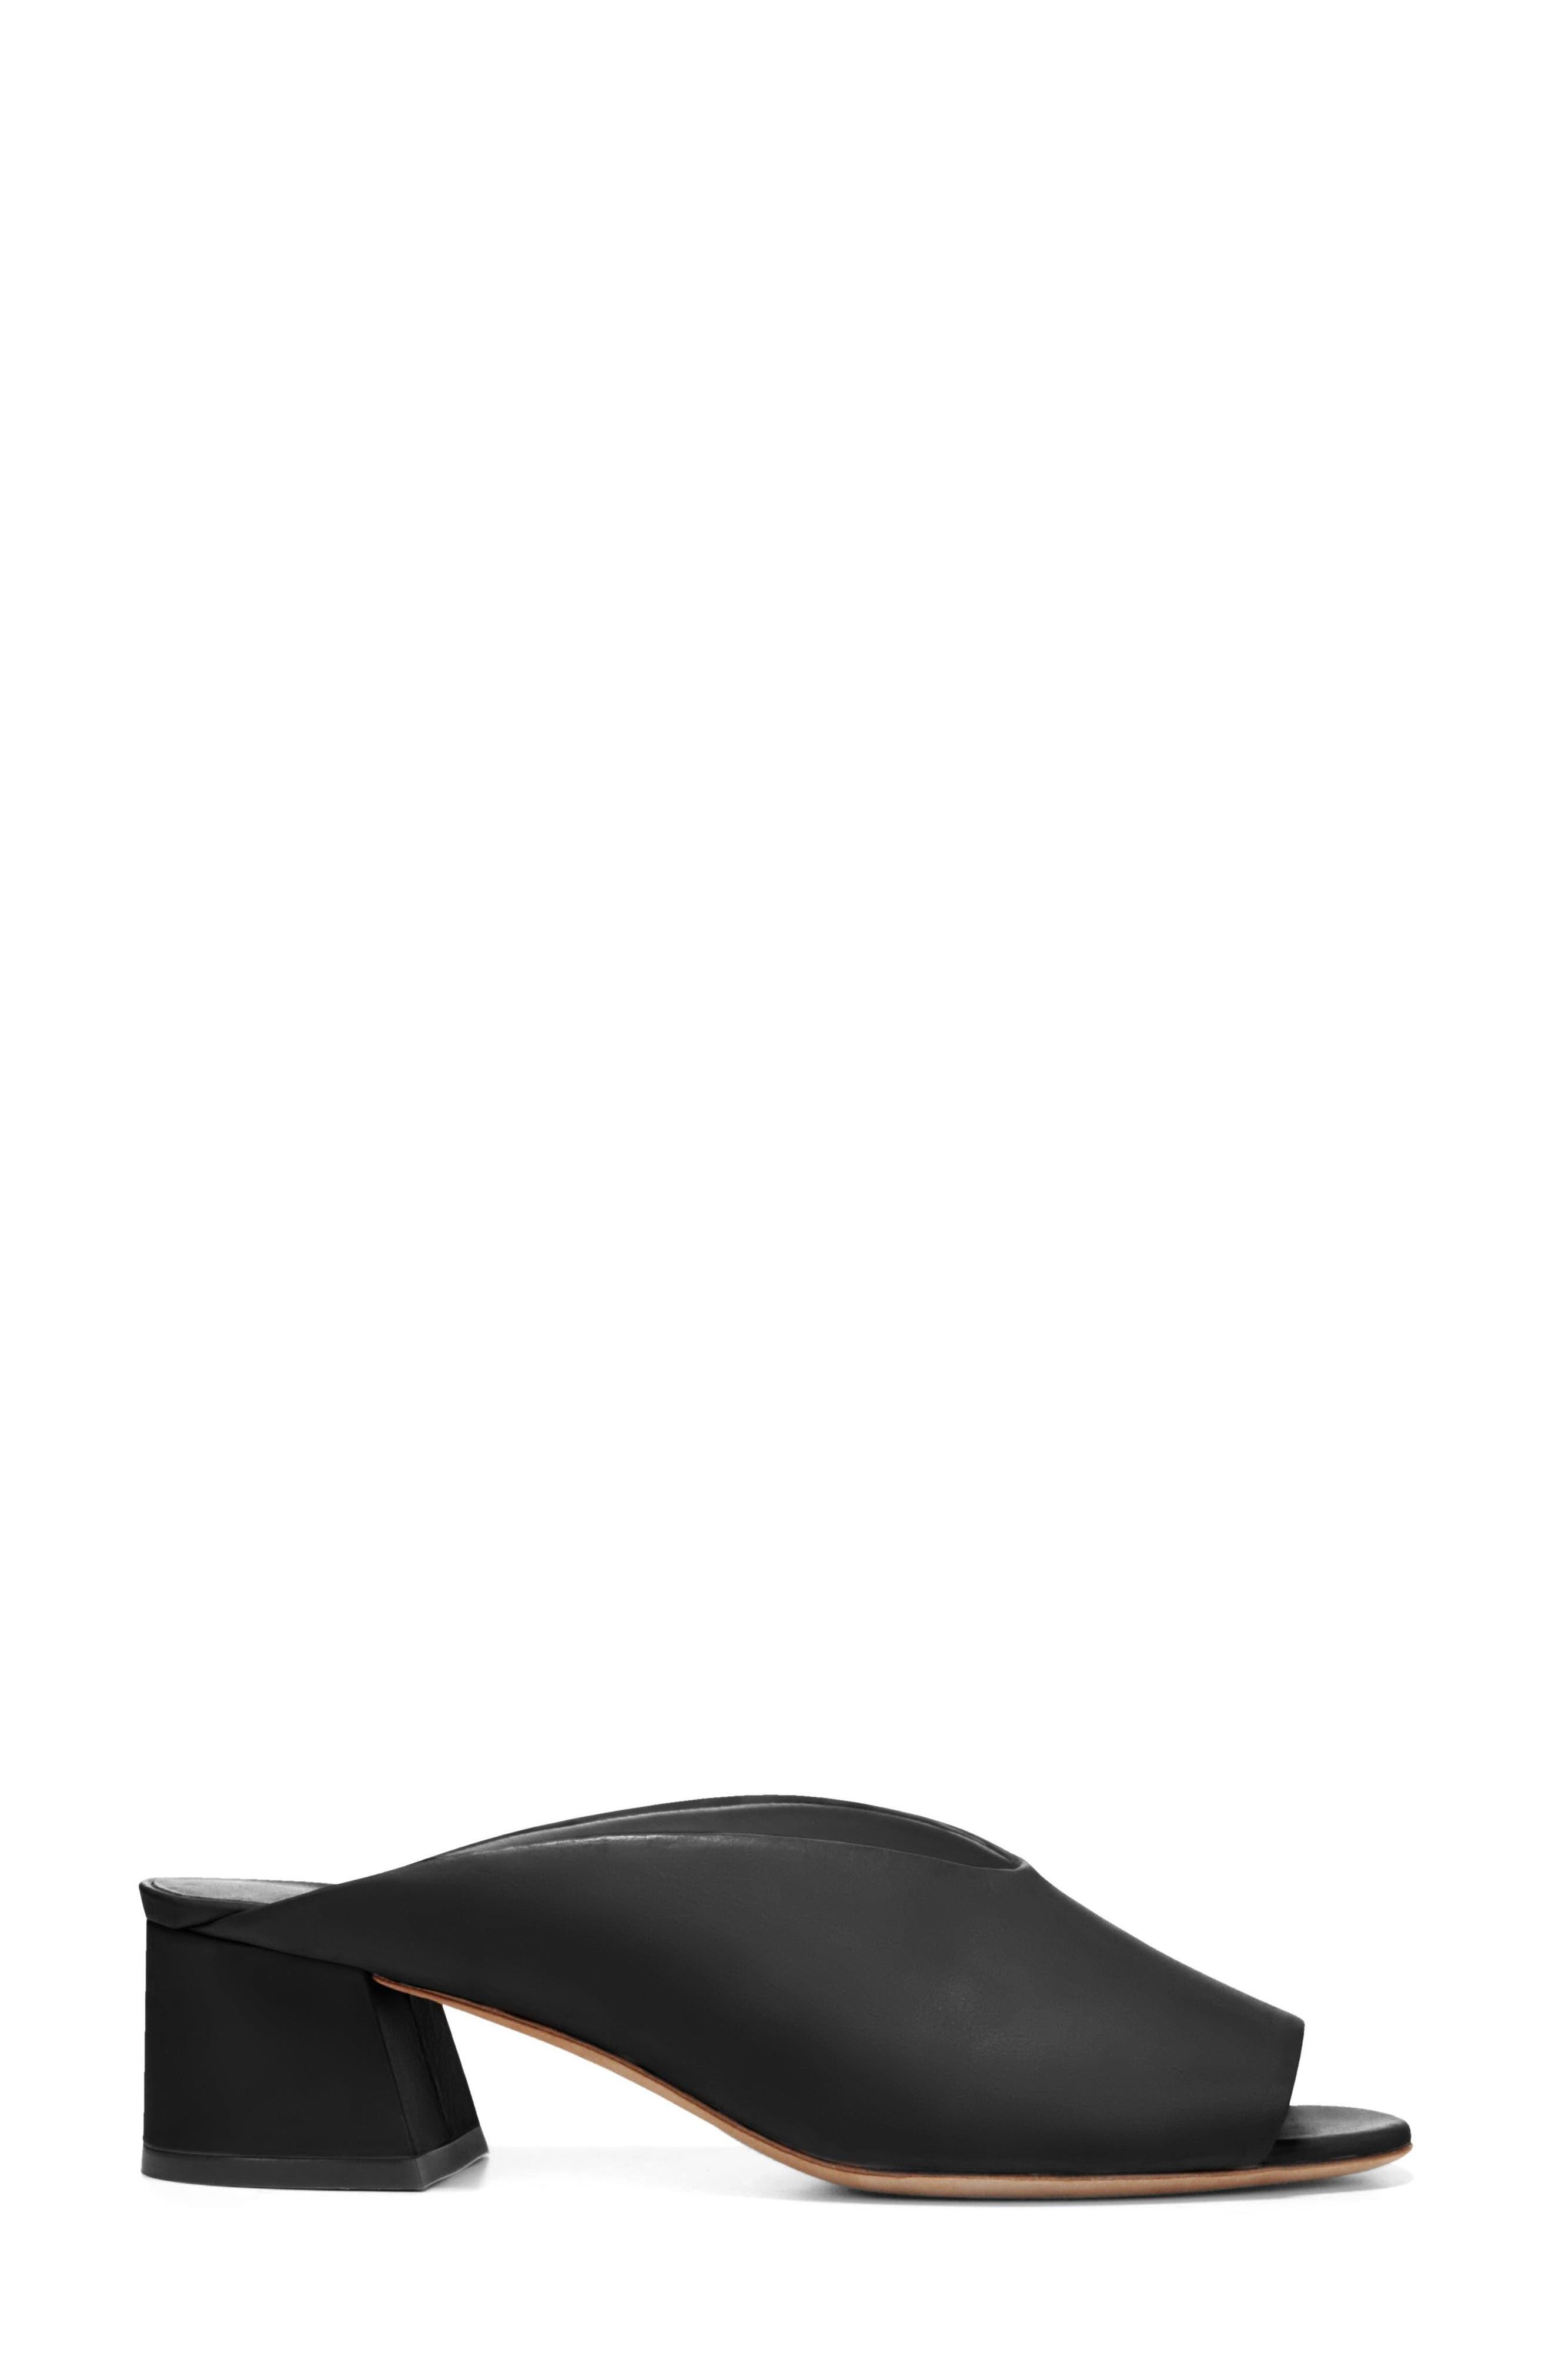 Cachet Sandal,                             Alternate thumbnail 3, color,                             BLACK SIVIGLIA CALF